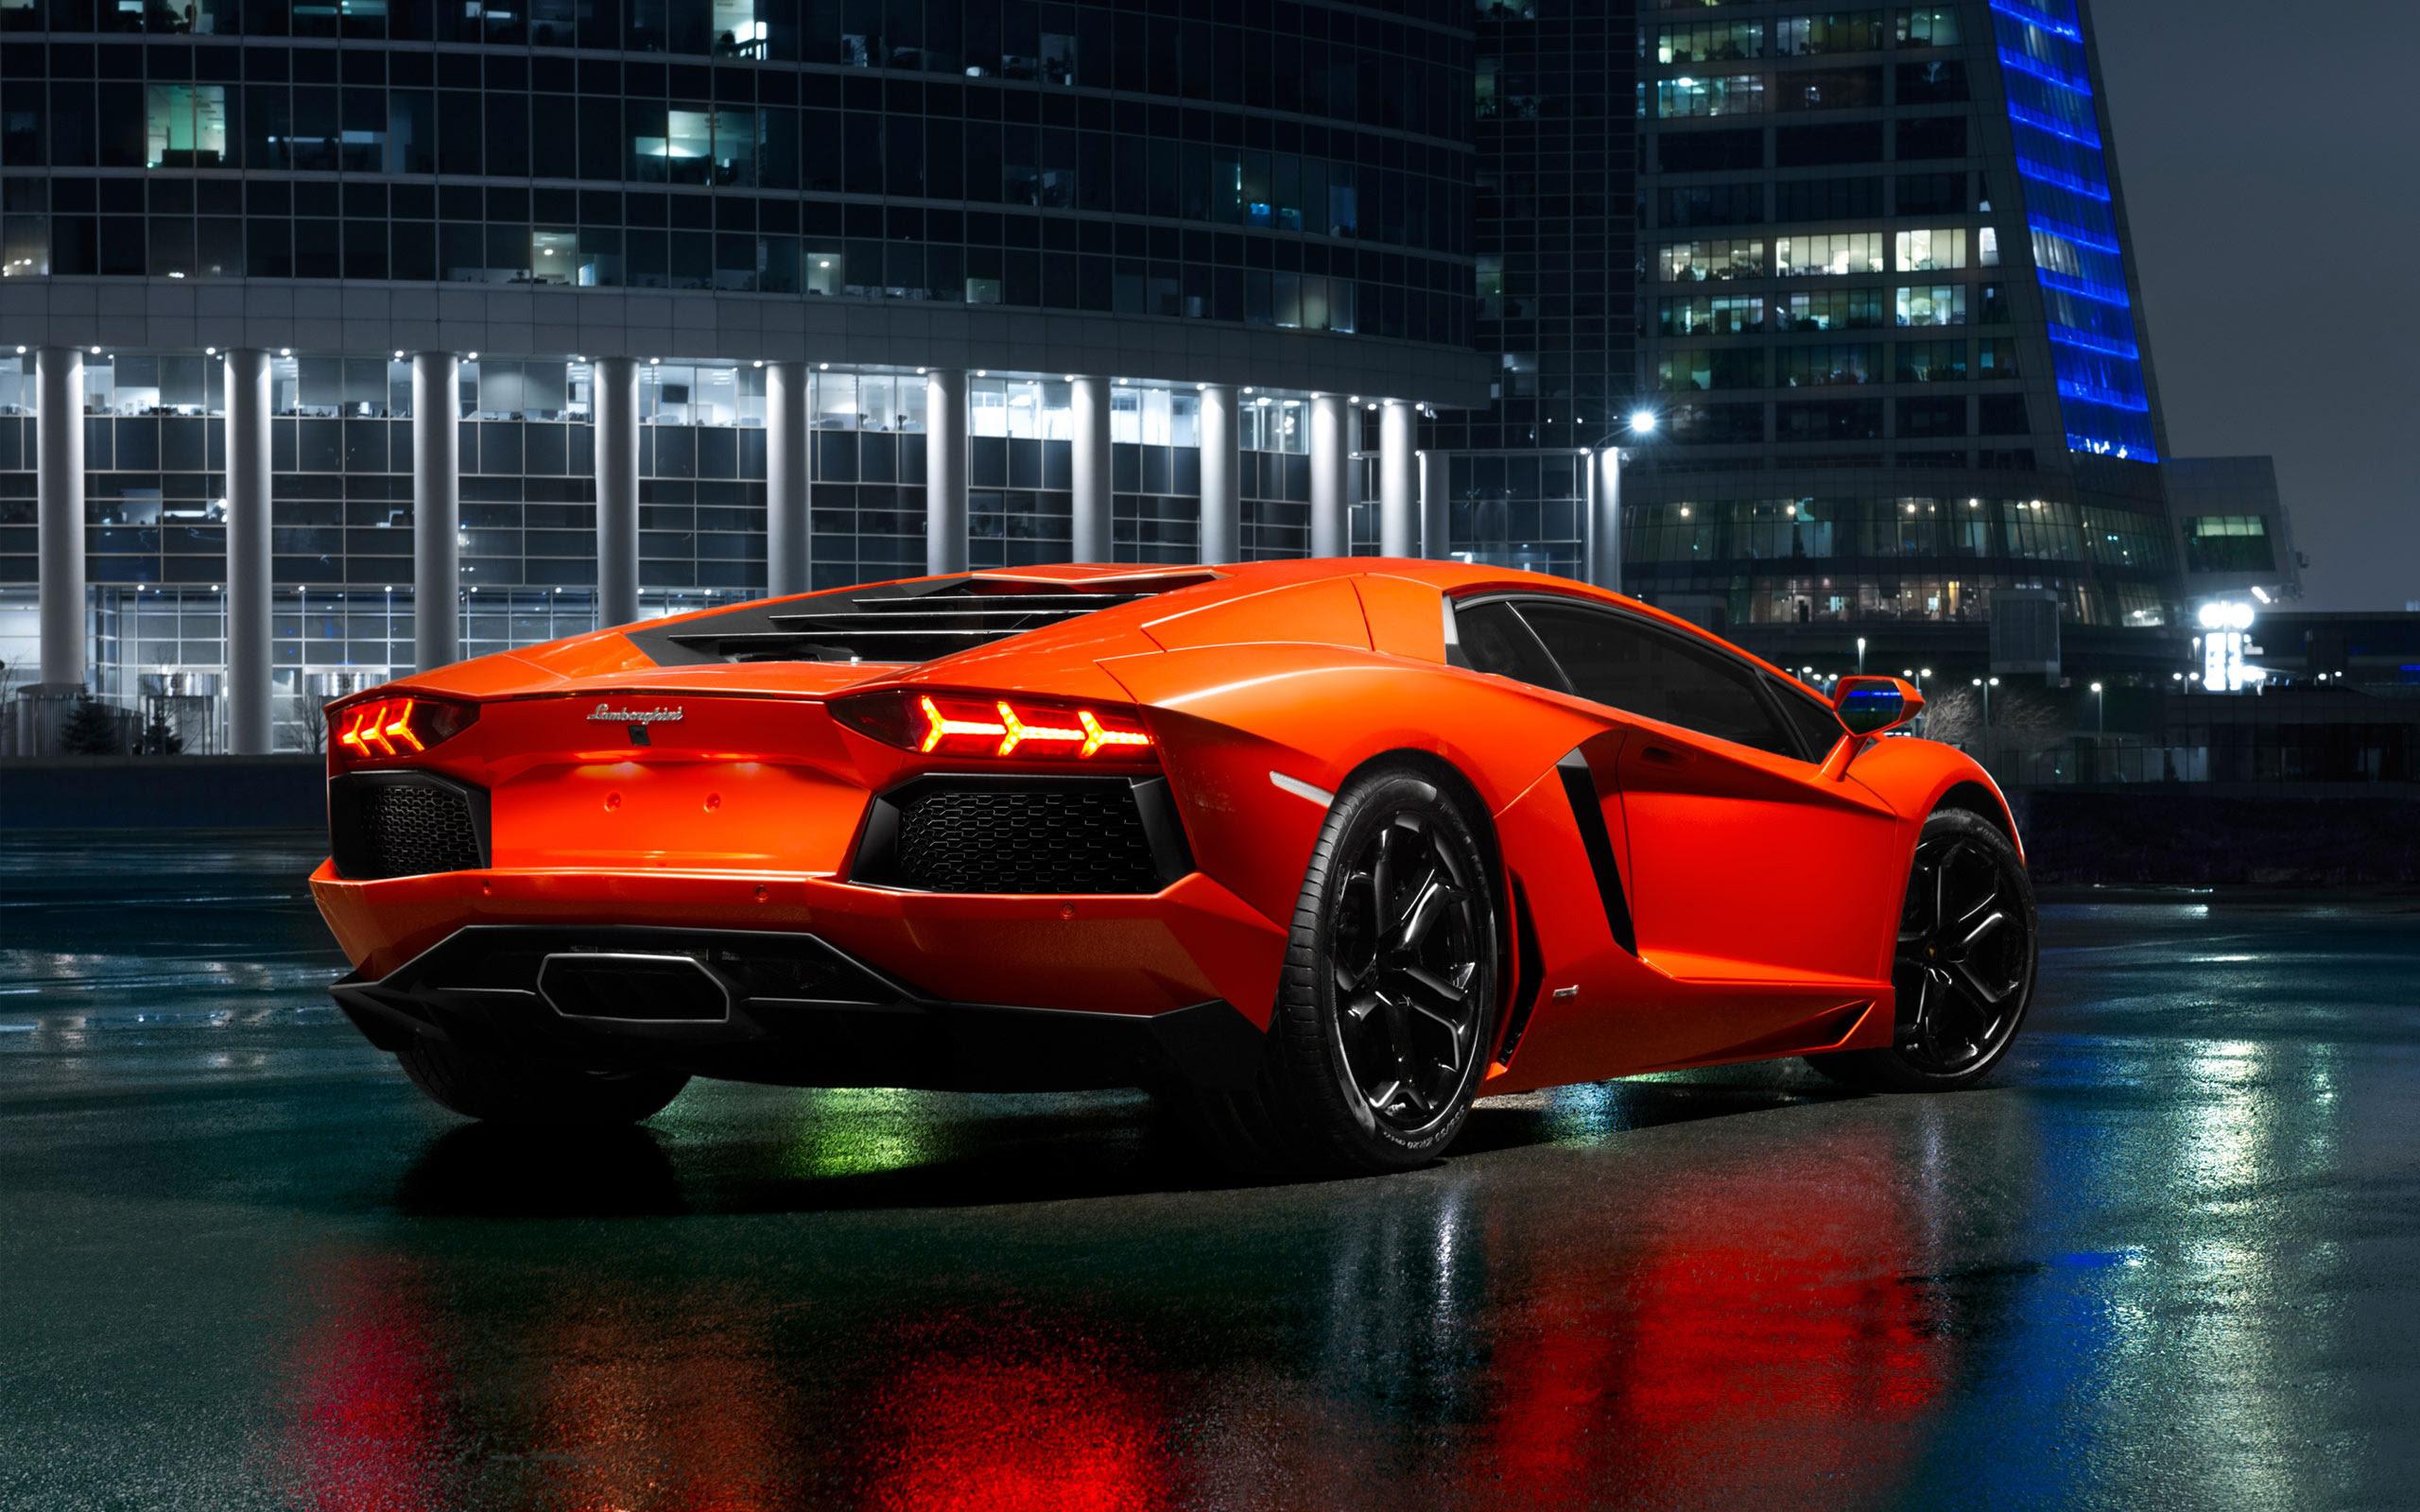 Lamborghini Aventador LP700 4 5 Wallpaper  HD Car Wallpapers  ID 3238